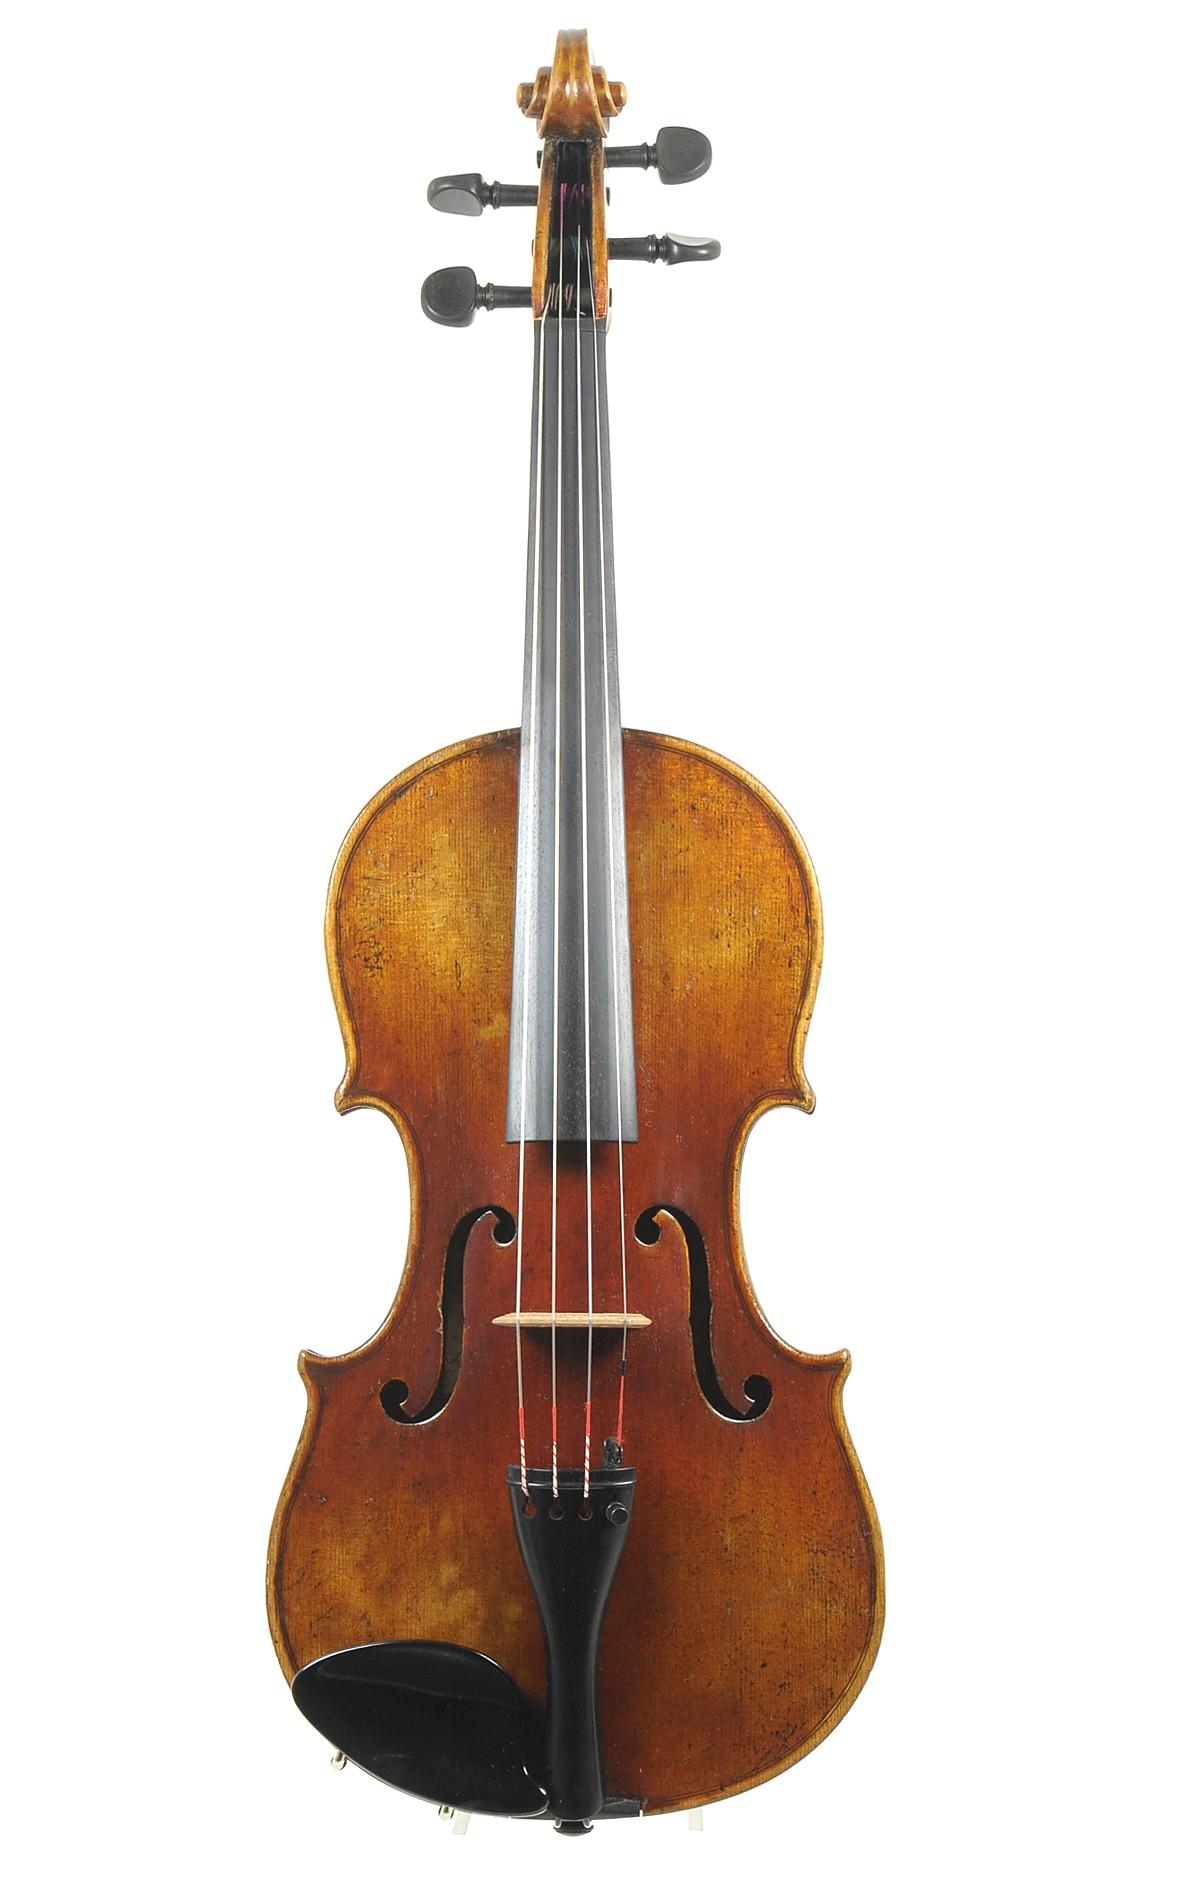 Southern German violin by Carl Ruckmich